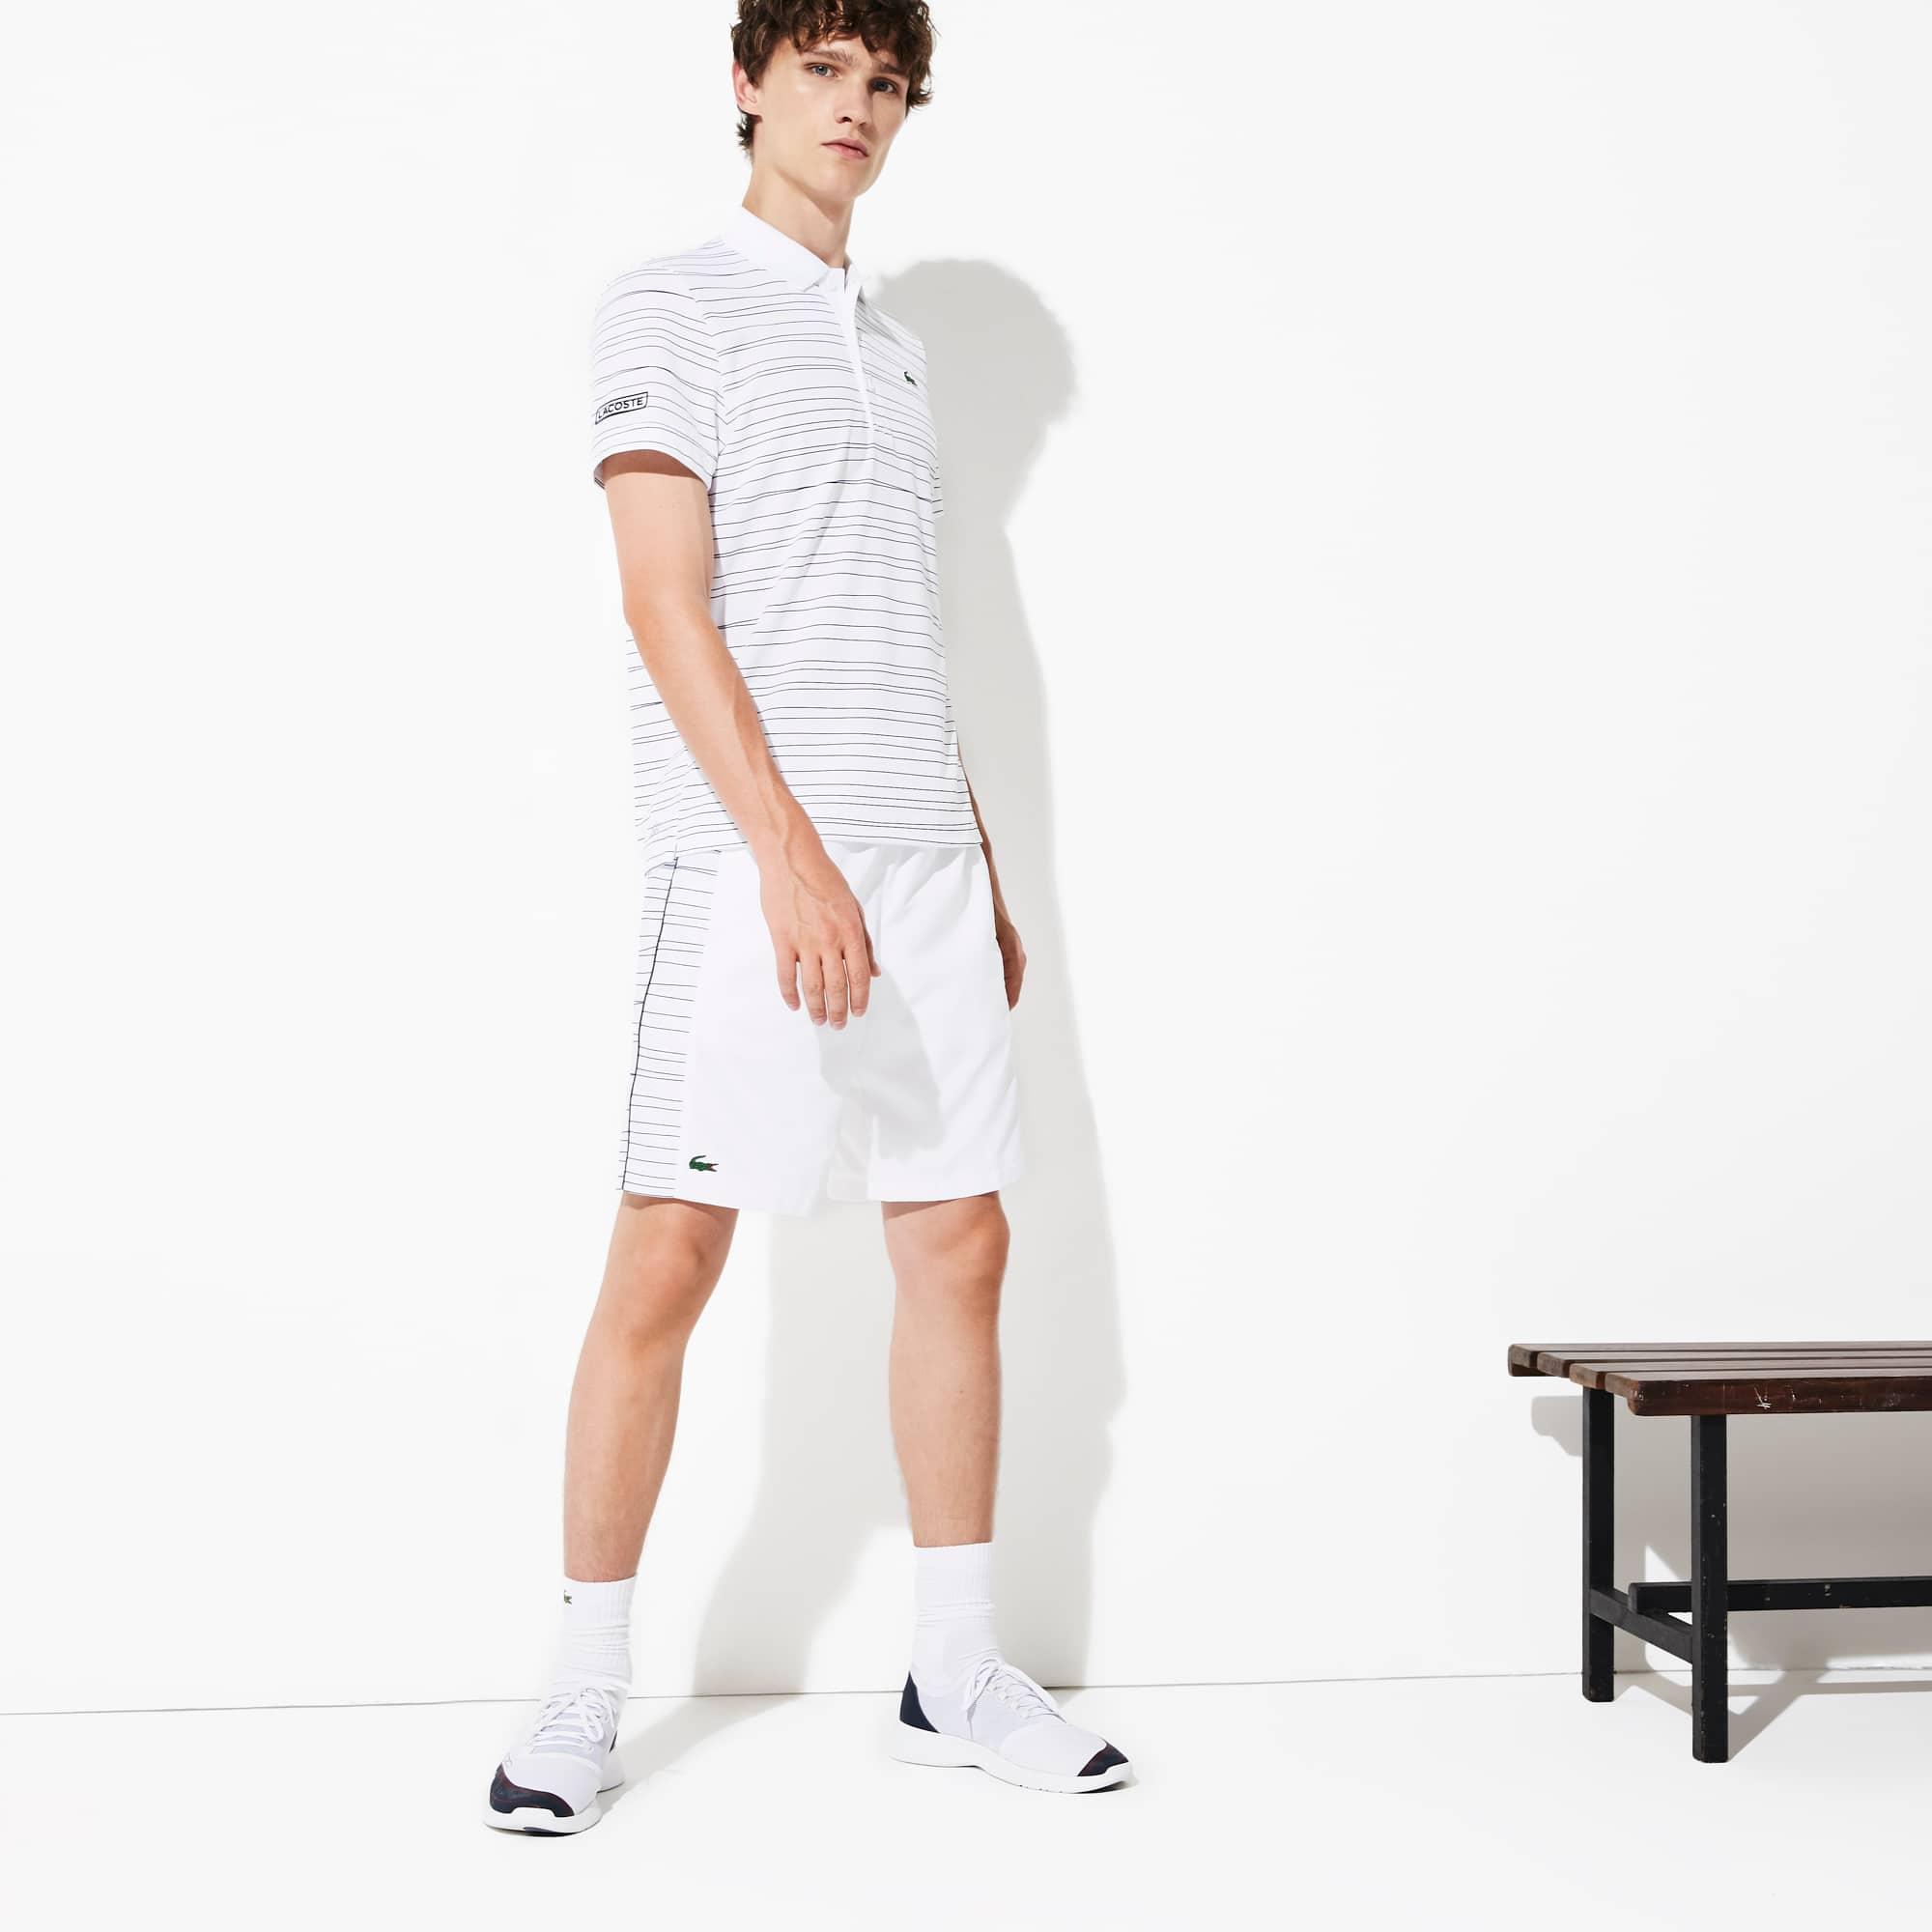 Lacoste Shorts Men's SPORT Side-Print Tennis Shorts